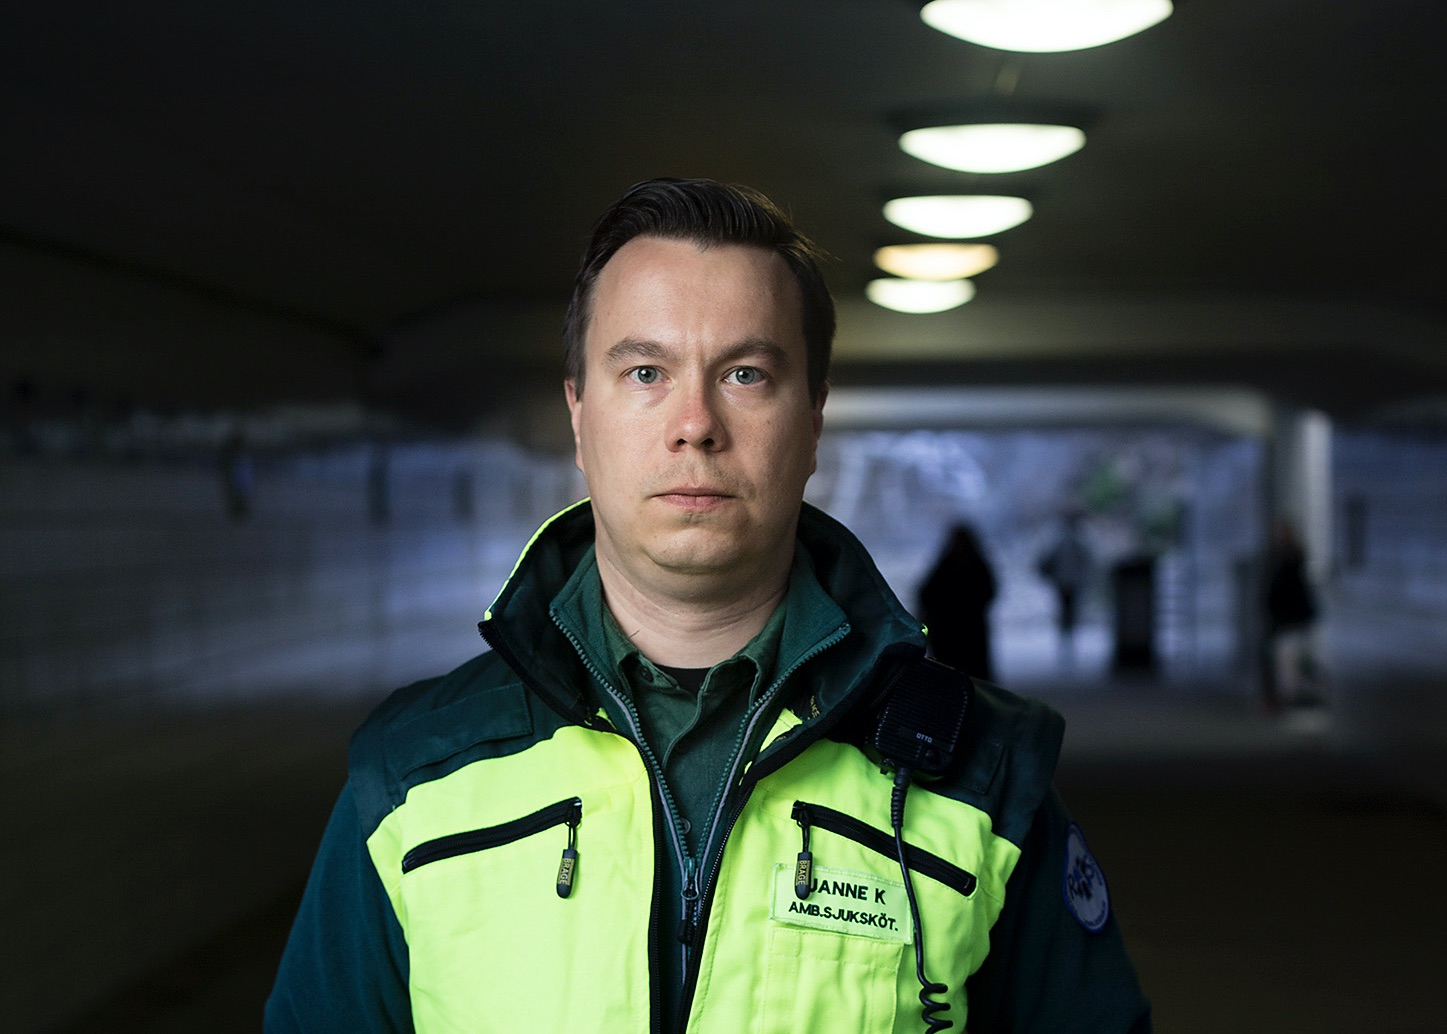 Janne Kautto forteller om utfordringer for nødetatene med vold og trusler i Sverige. Foto: Privat